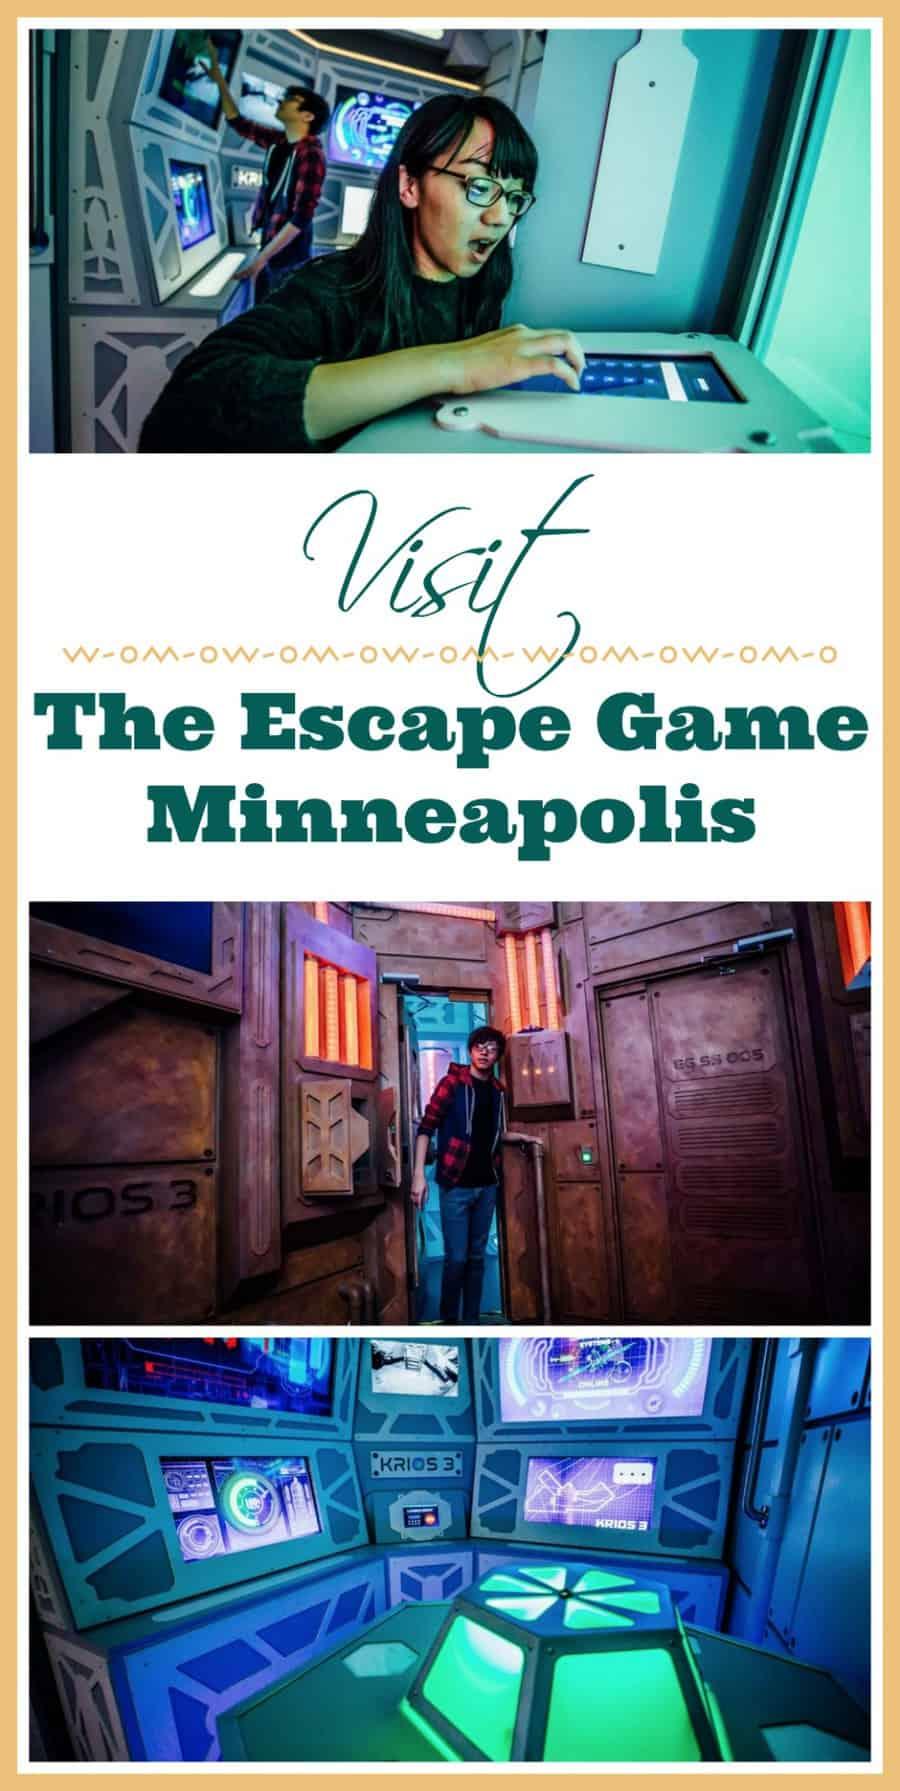 The Escape Game Minneapolis Review